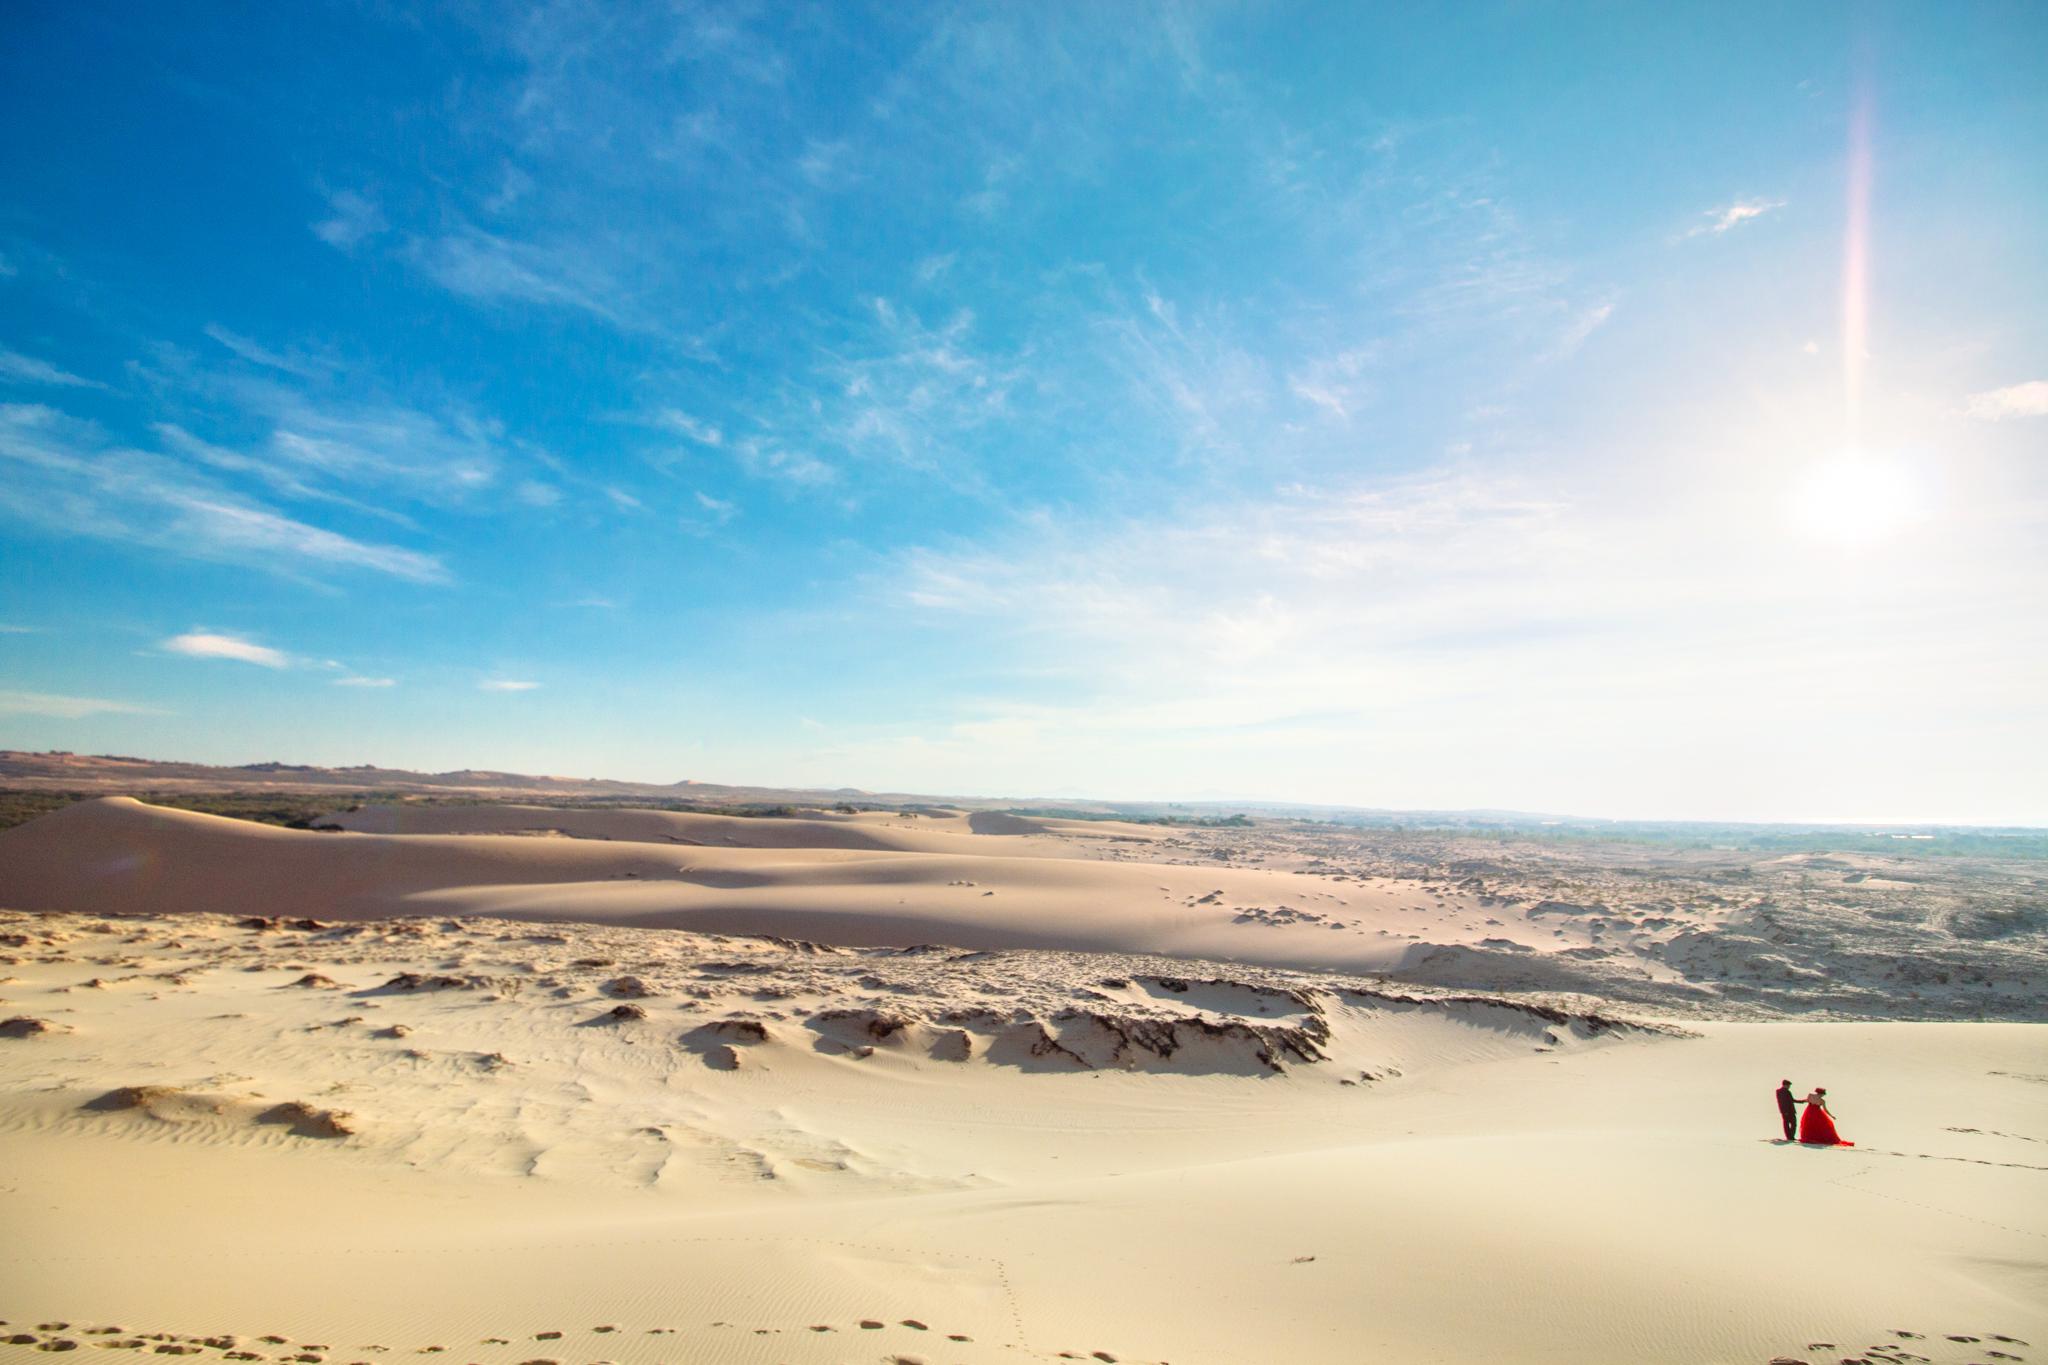 Baisha (White Sand) Dune